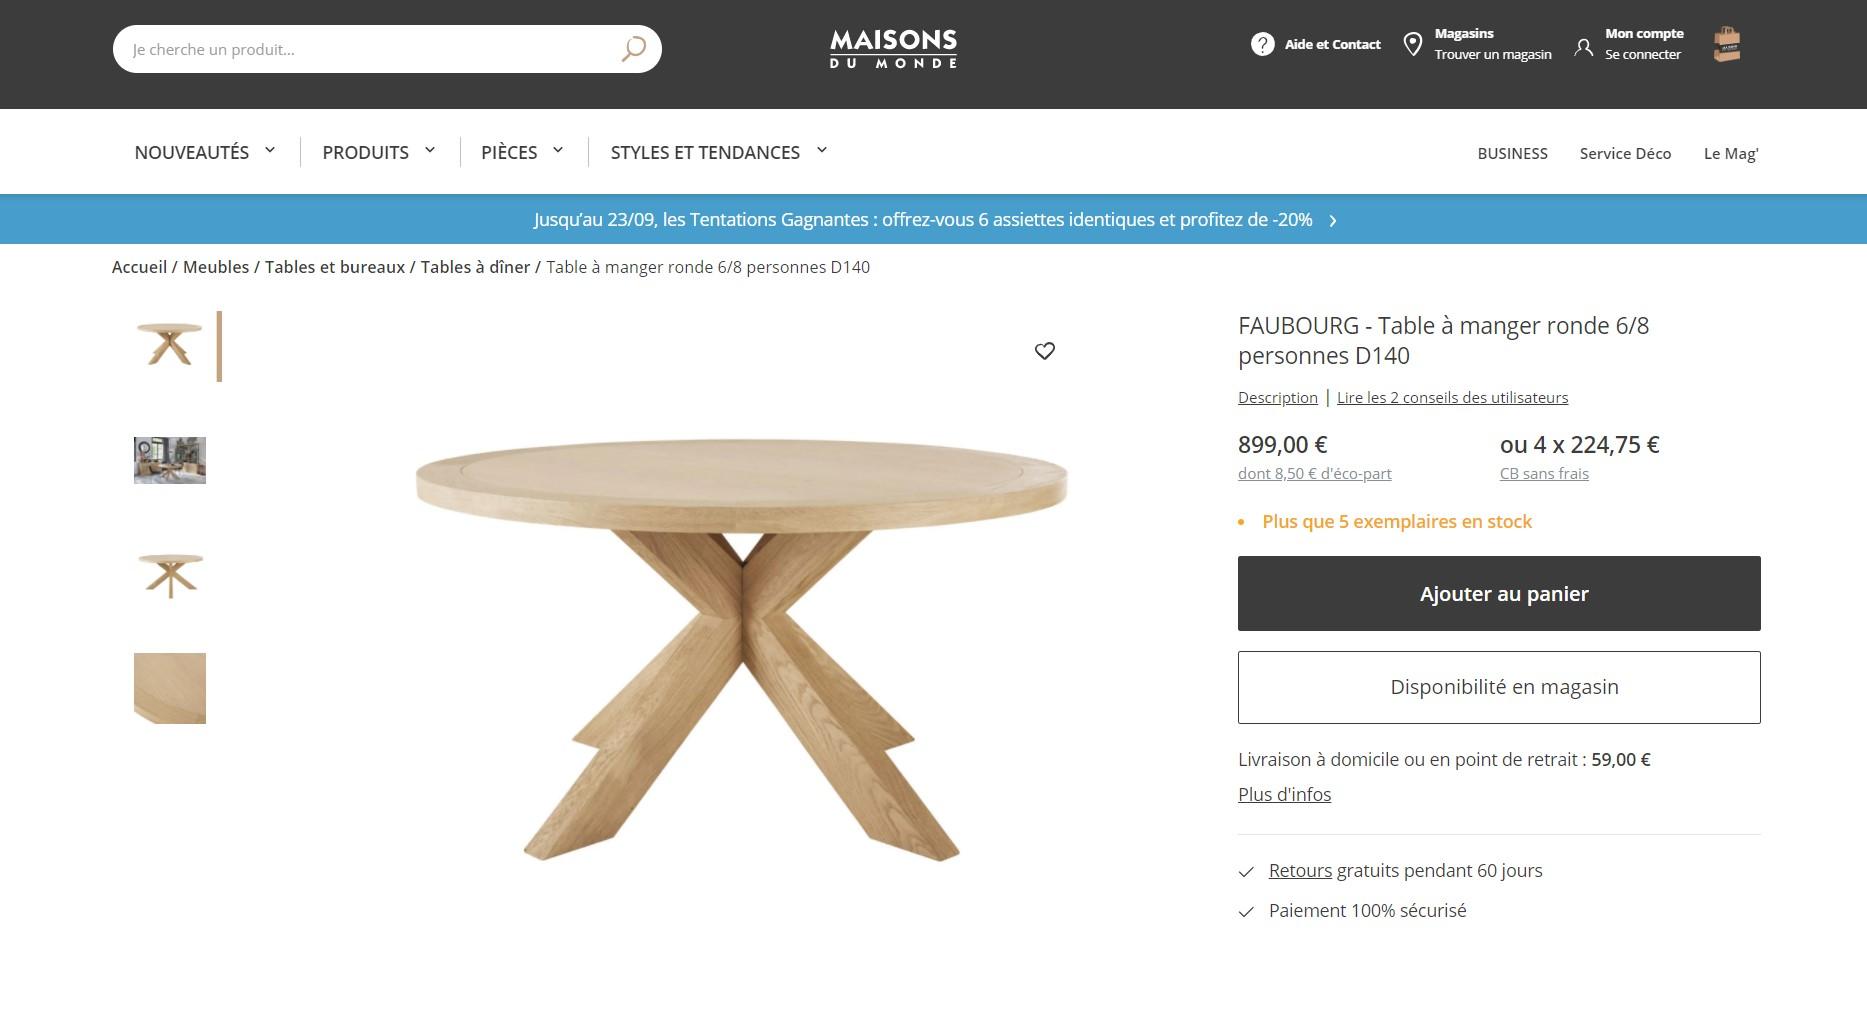 Une table avec rallonge en bois